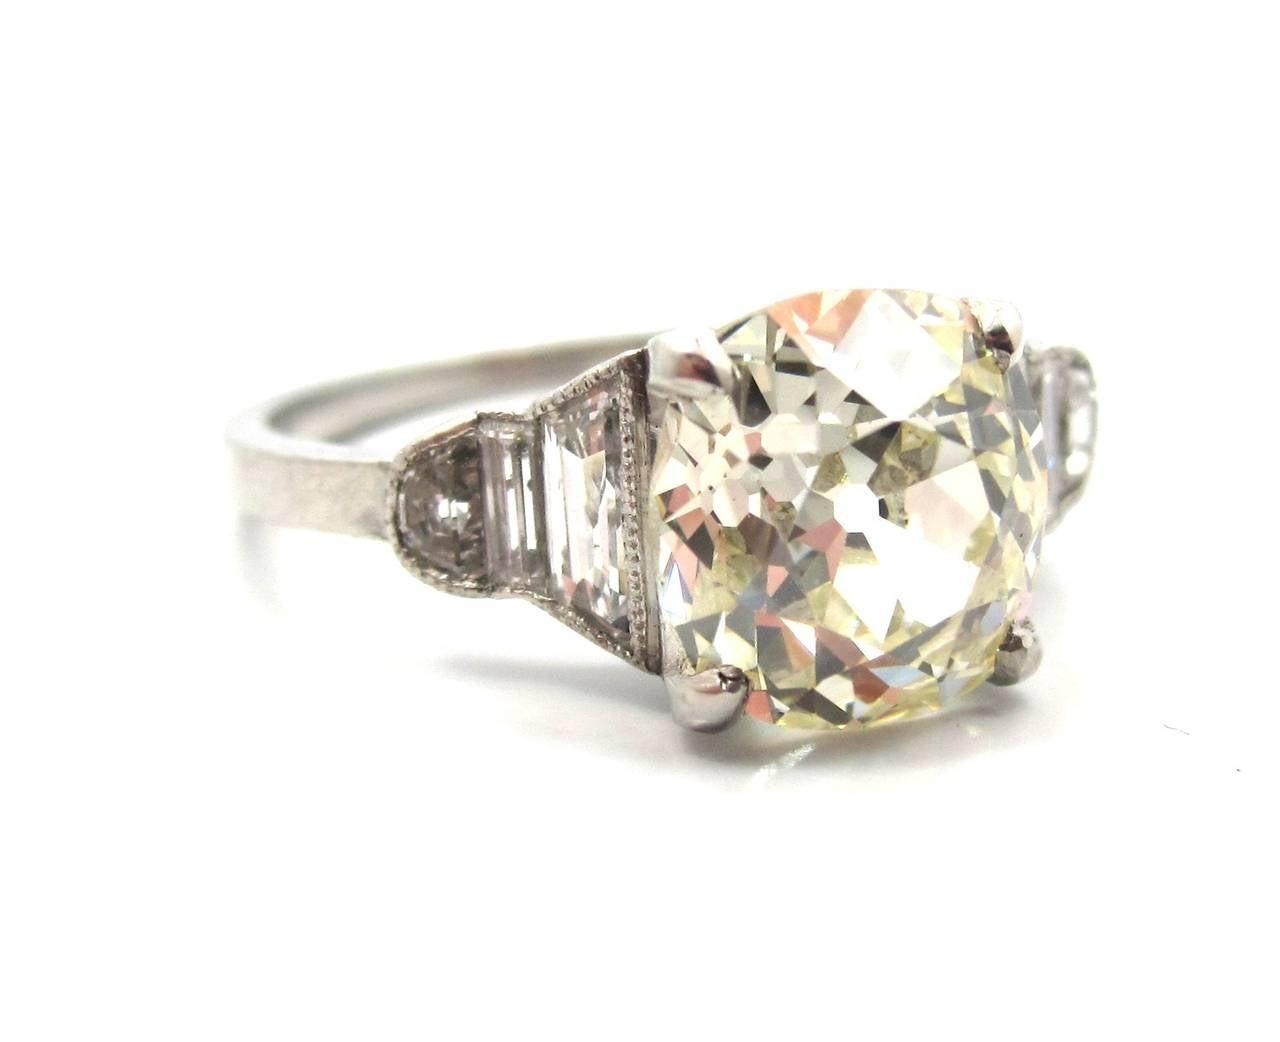 Art Deco 2 00 Carat Cushion Cut Diamond Platinum Engagement Ring at 1stdibs